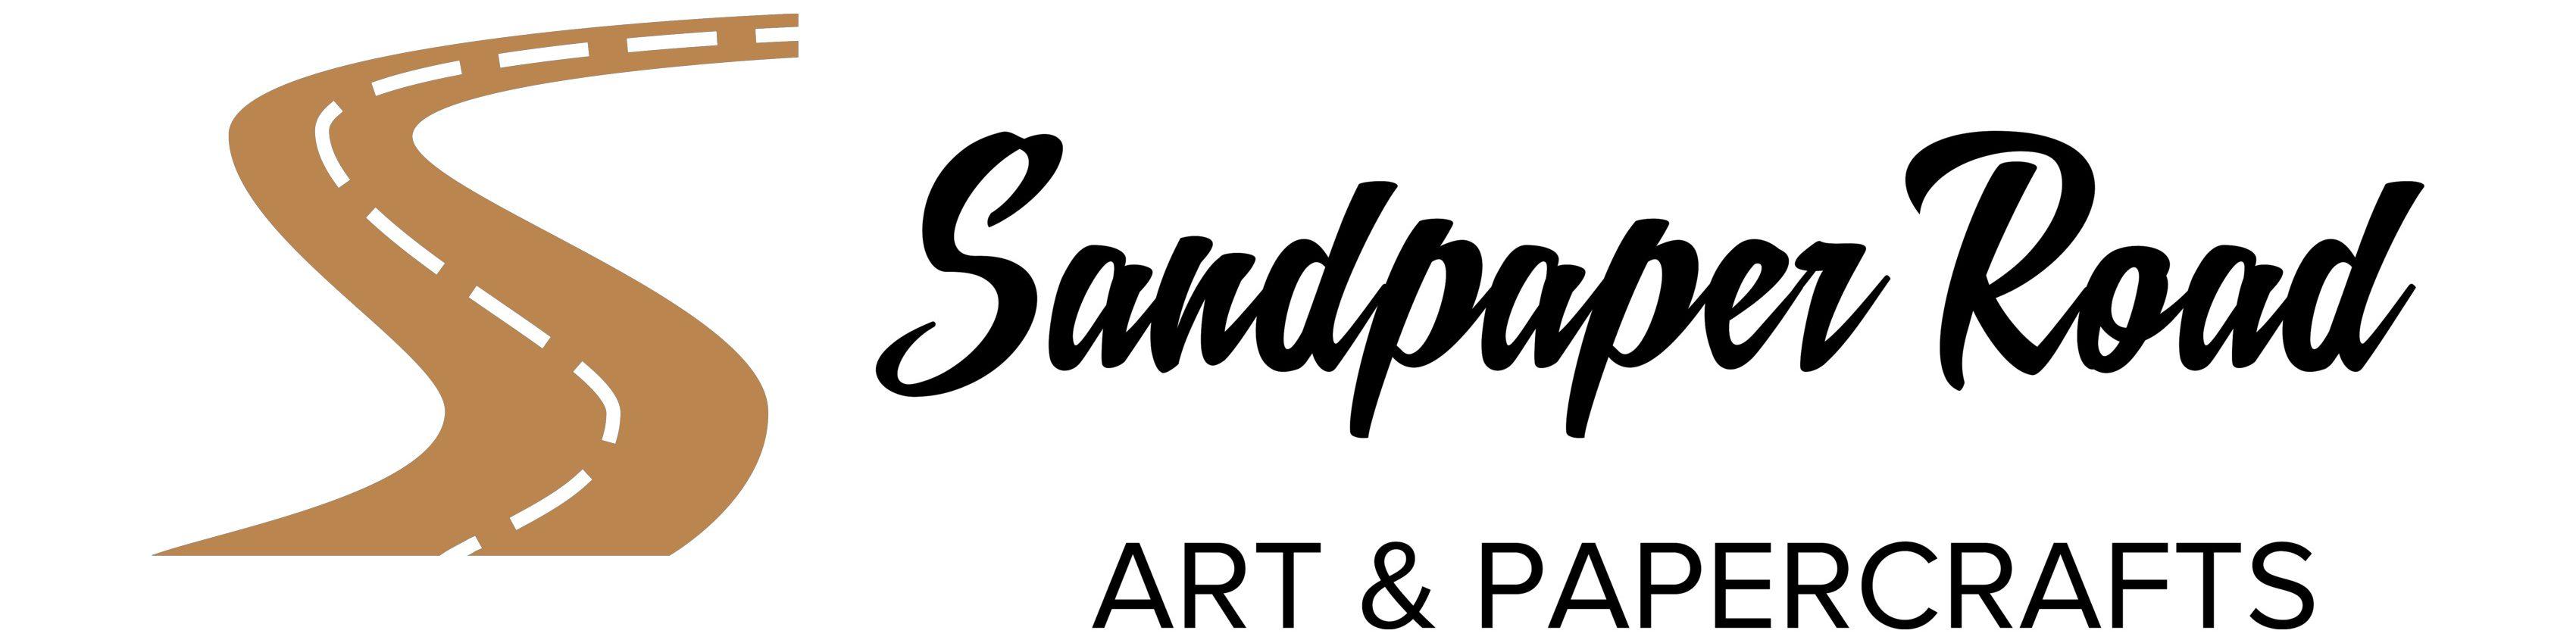 Sandpaper Road